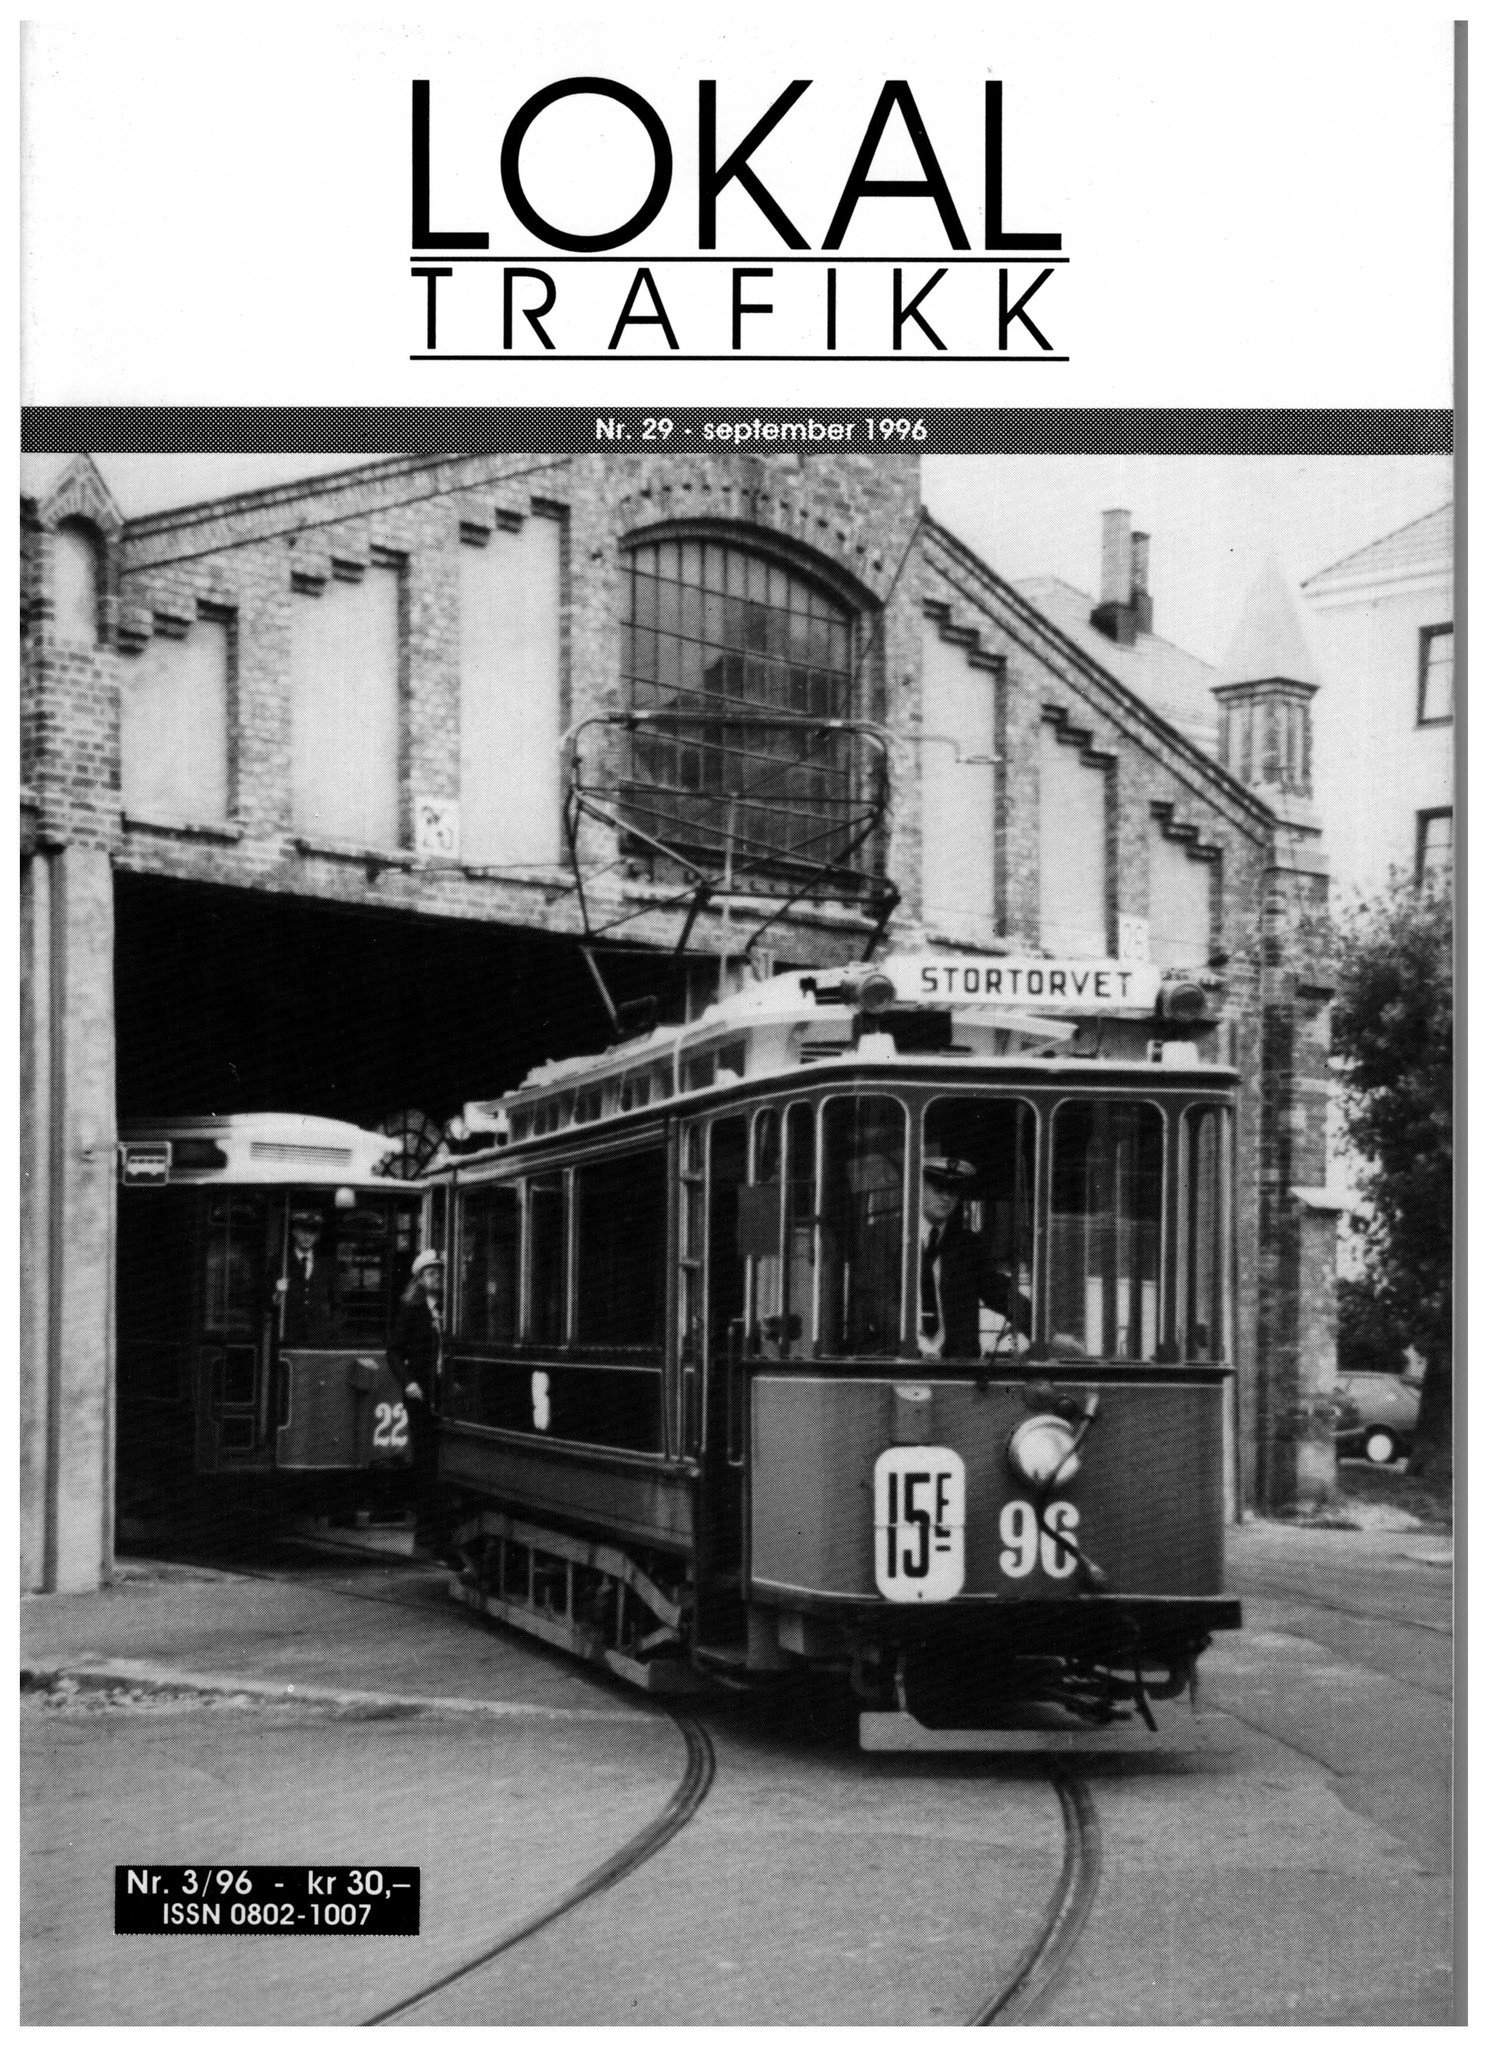 Lokaltrafikk #029